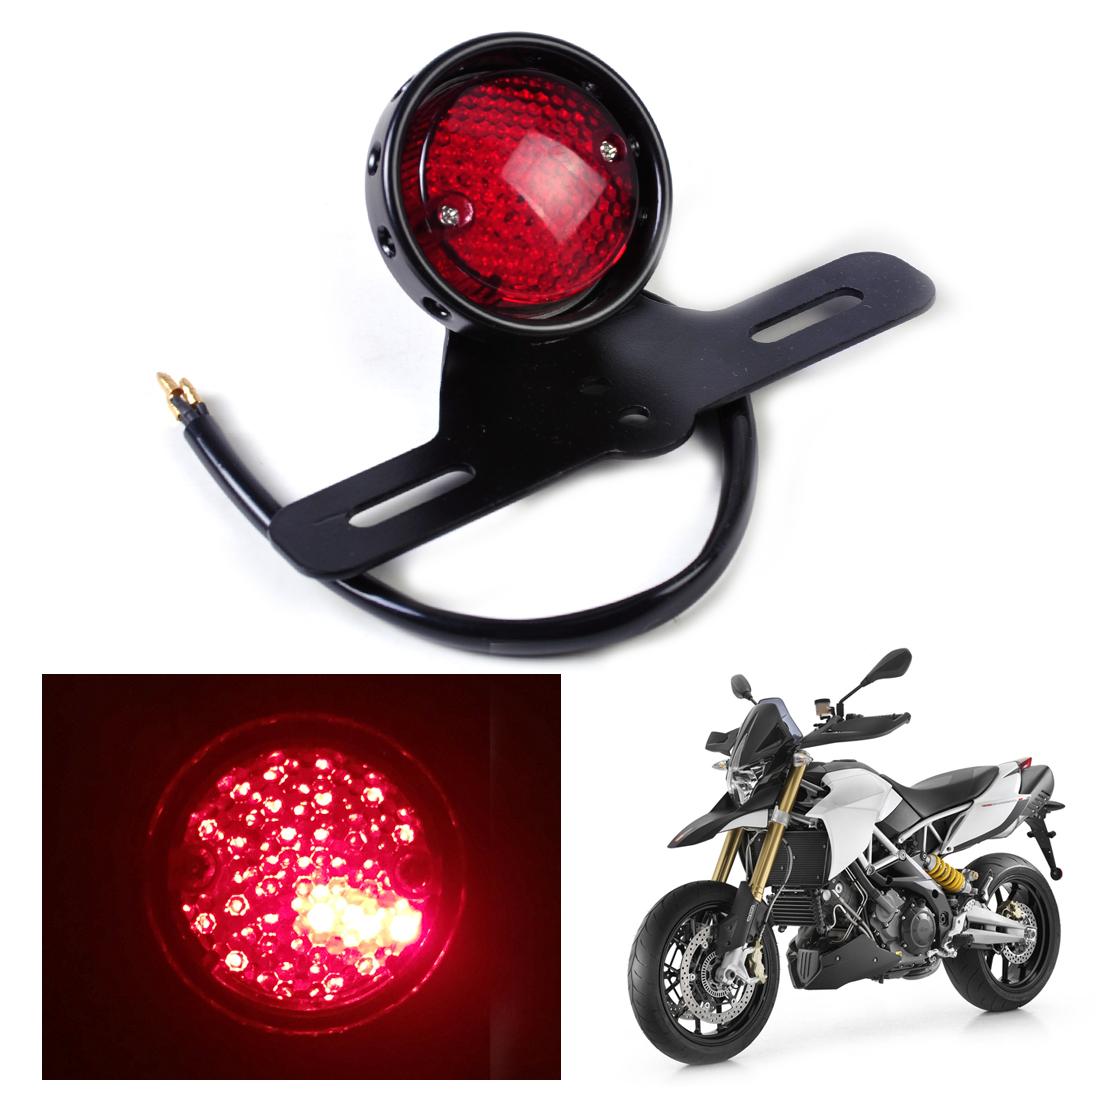 DWCX Motorcycle LED Retro Red Rear Tail Brake Stop Light Lamp W/ License Plate Mount for Harley Honda Suzuki Chopper Bobber